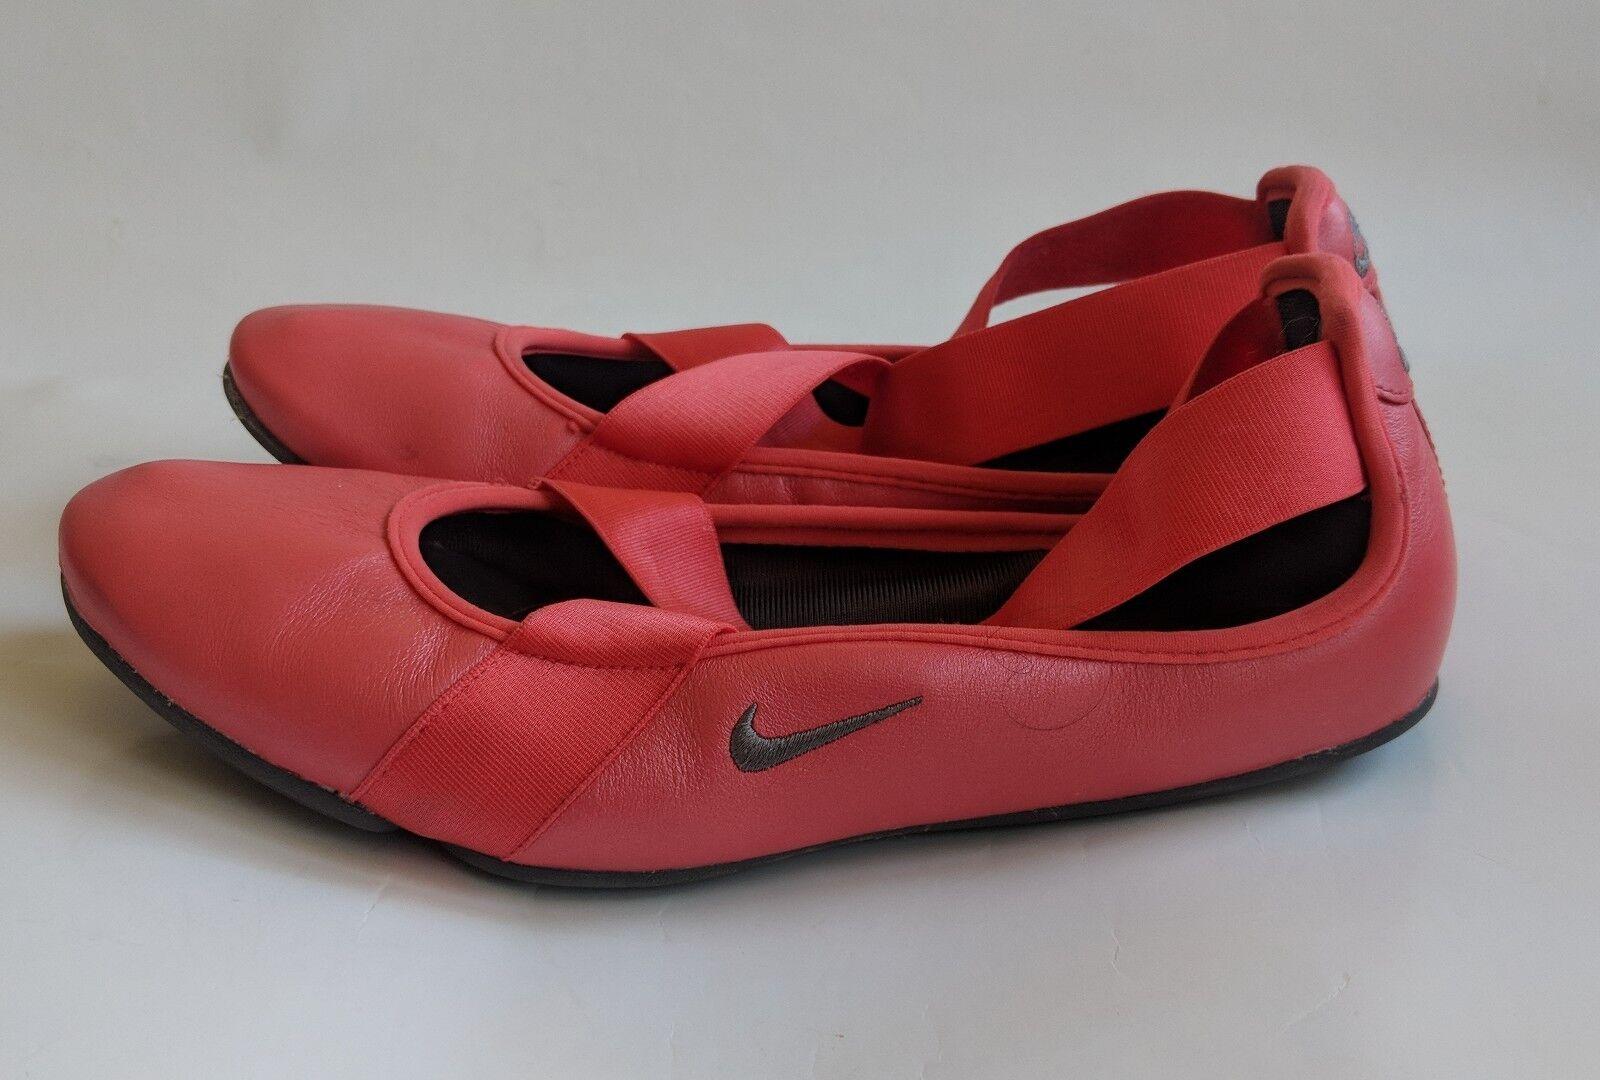 Womens 2010 Nike Le Titia Ballet Cushion Casual Flats shoes   Dark Pink   Size 6